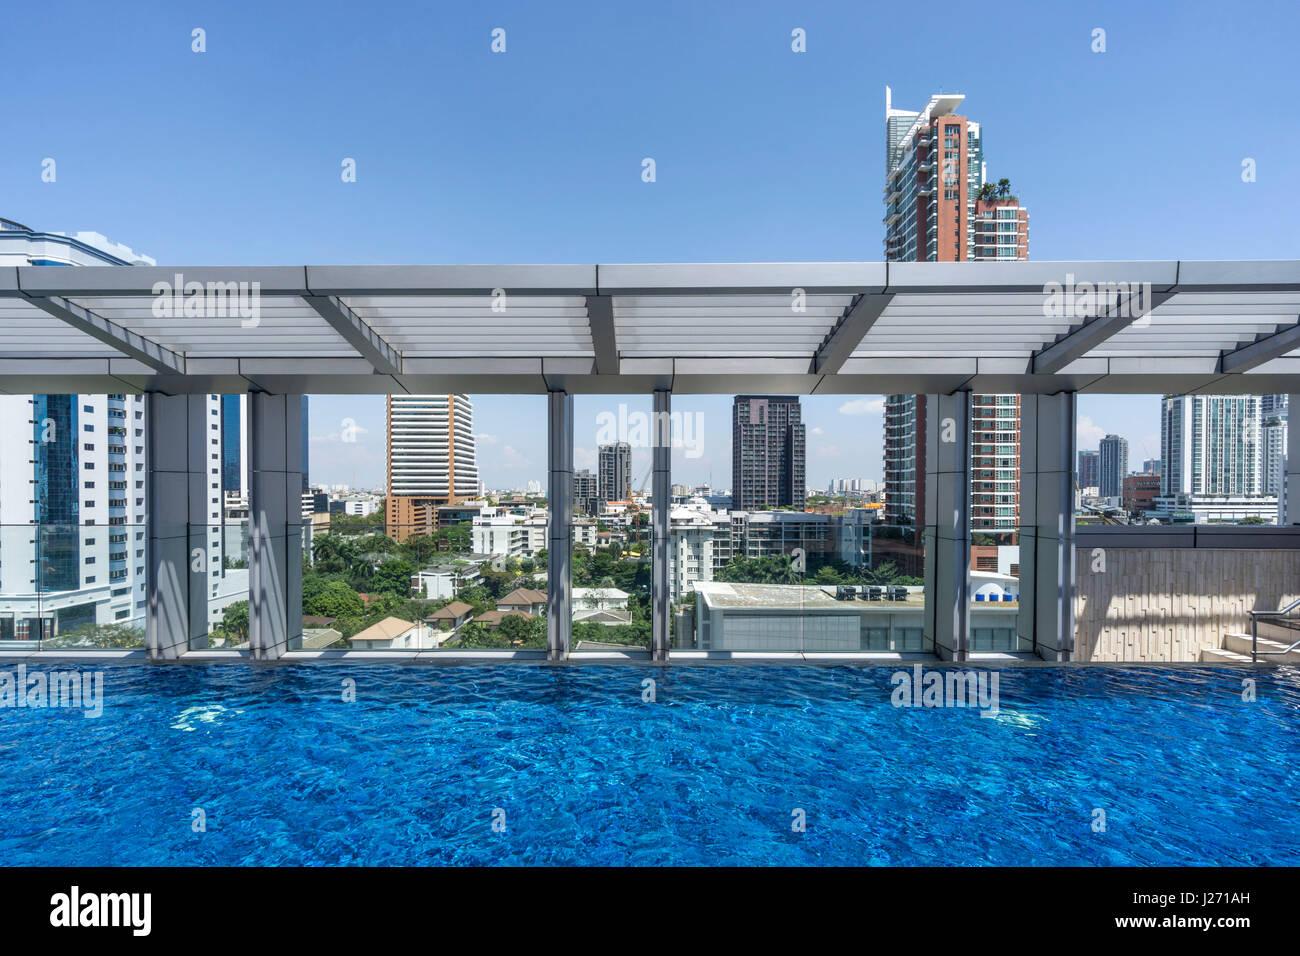 Il Marriot Hotel Sukhumvit, piscina, Skyline, Bangkok, Thailandia Immagini Stock